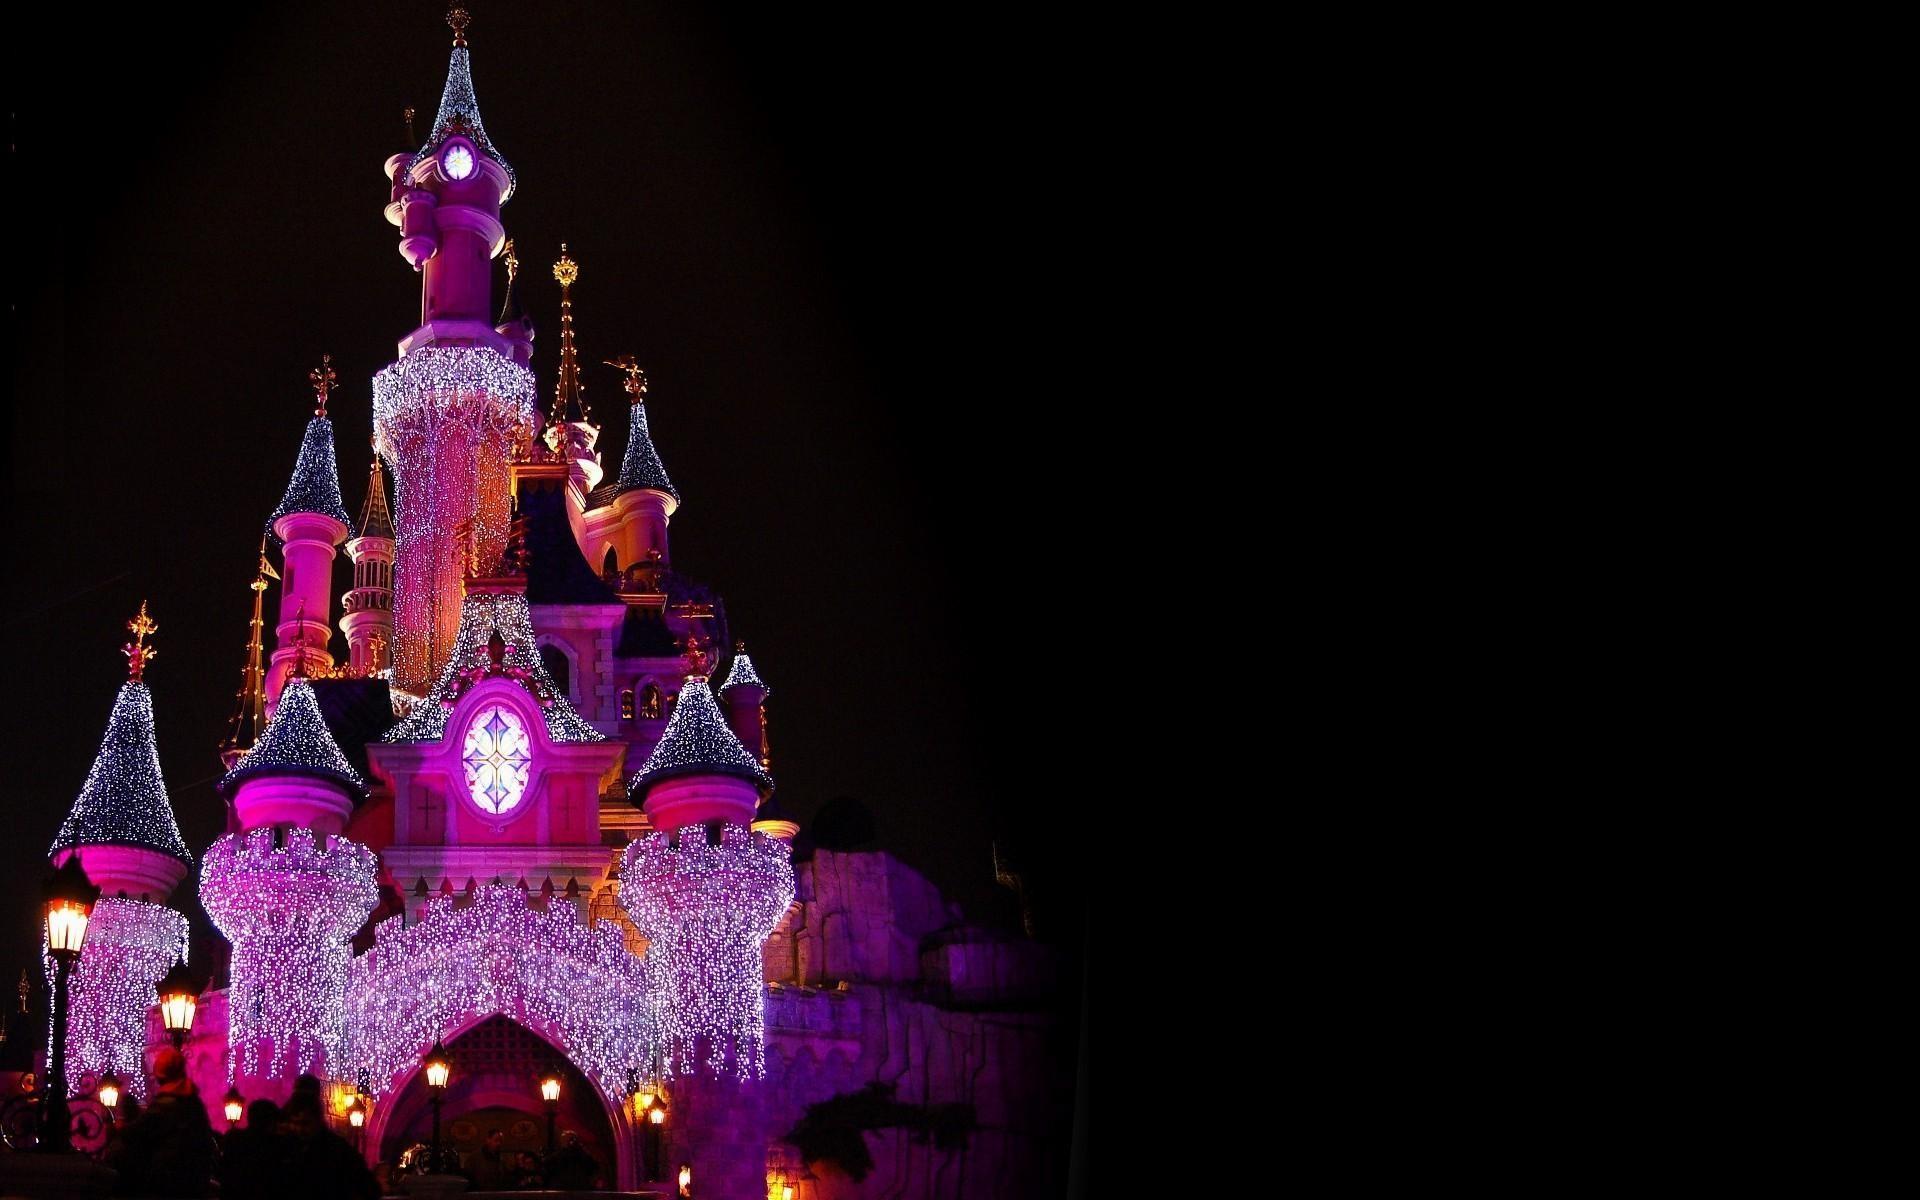 wallpaper.wiki-Disney-world-images-PIC-WPB009568